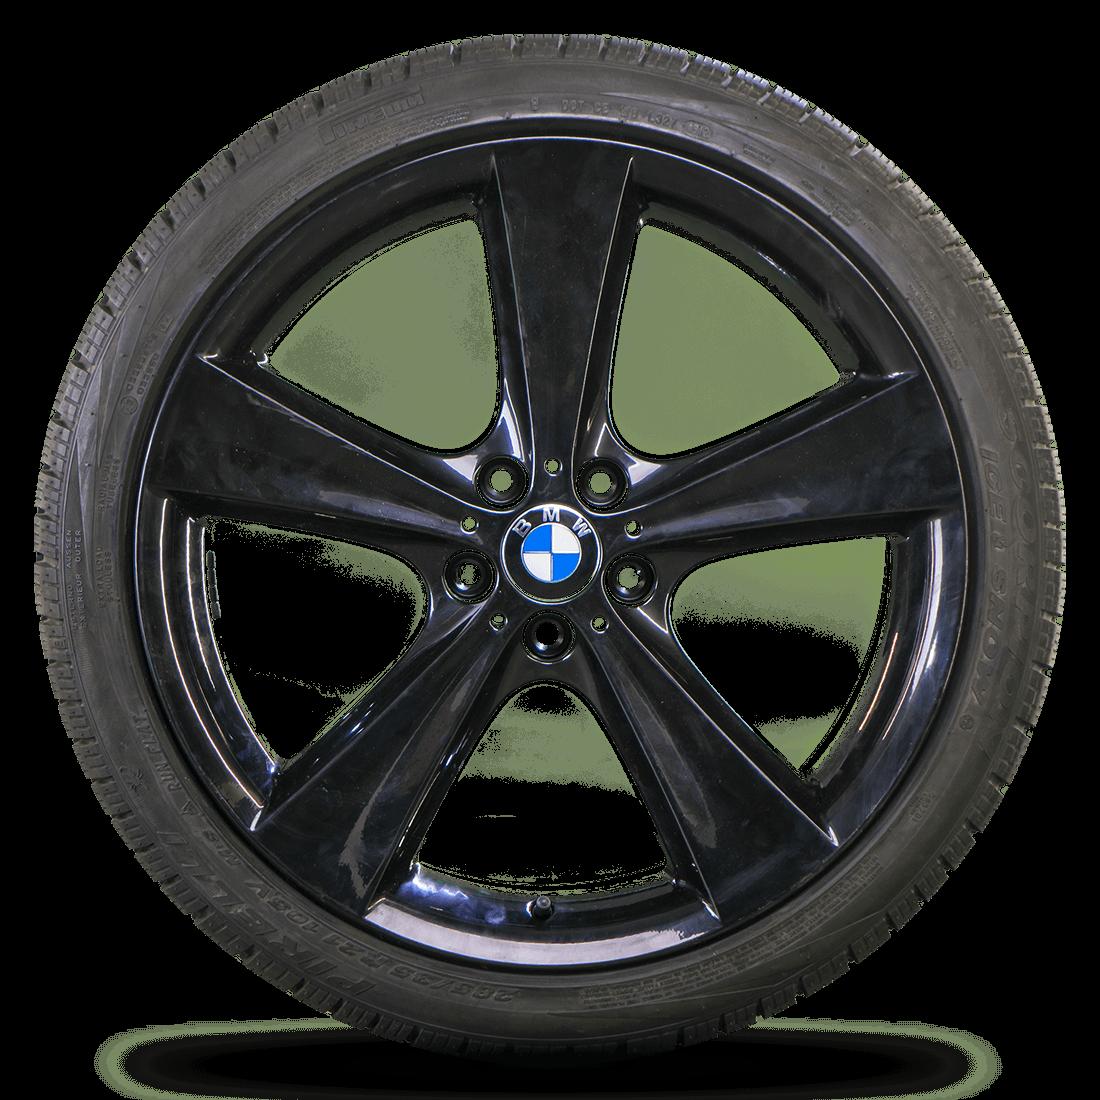 Bmw X6 Rims: BMW 21 Inch Rims X6 E71 E72 Aluminum Rims Winter Wheels